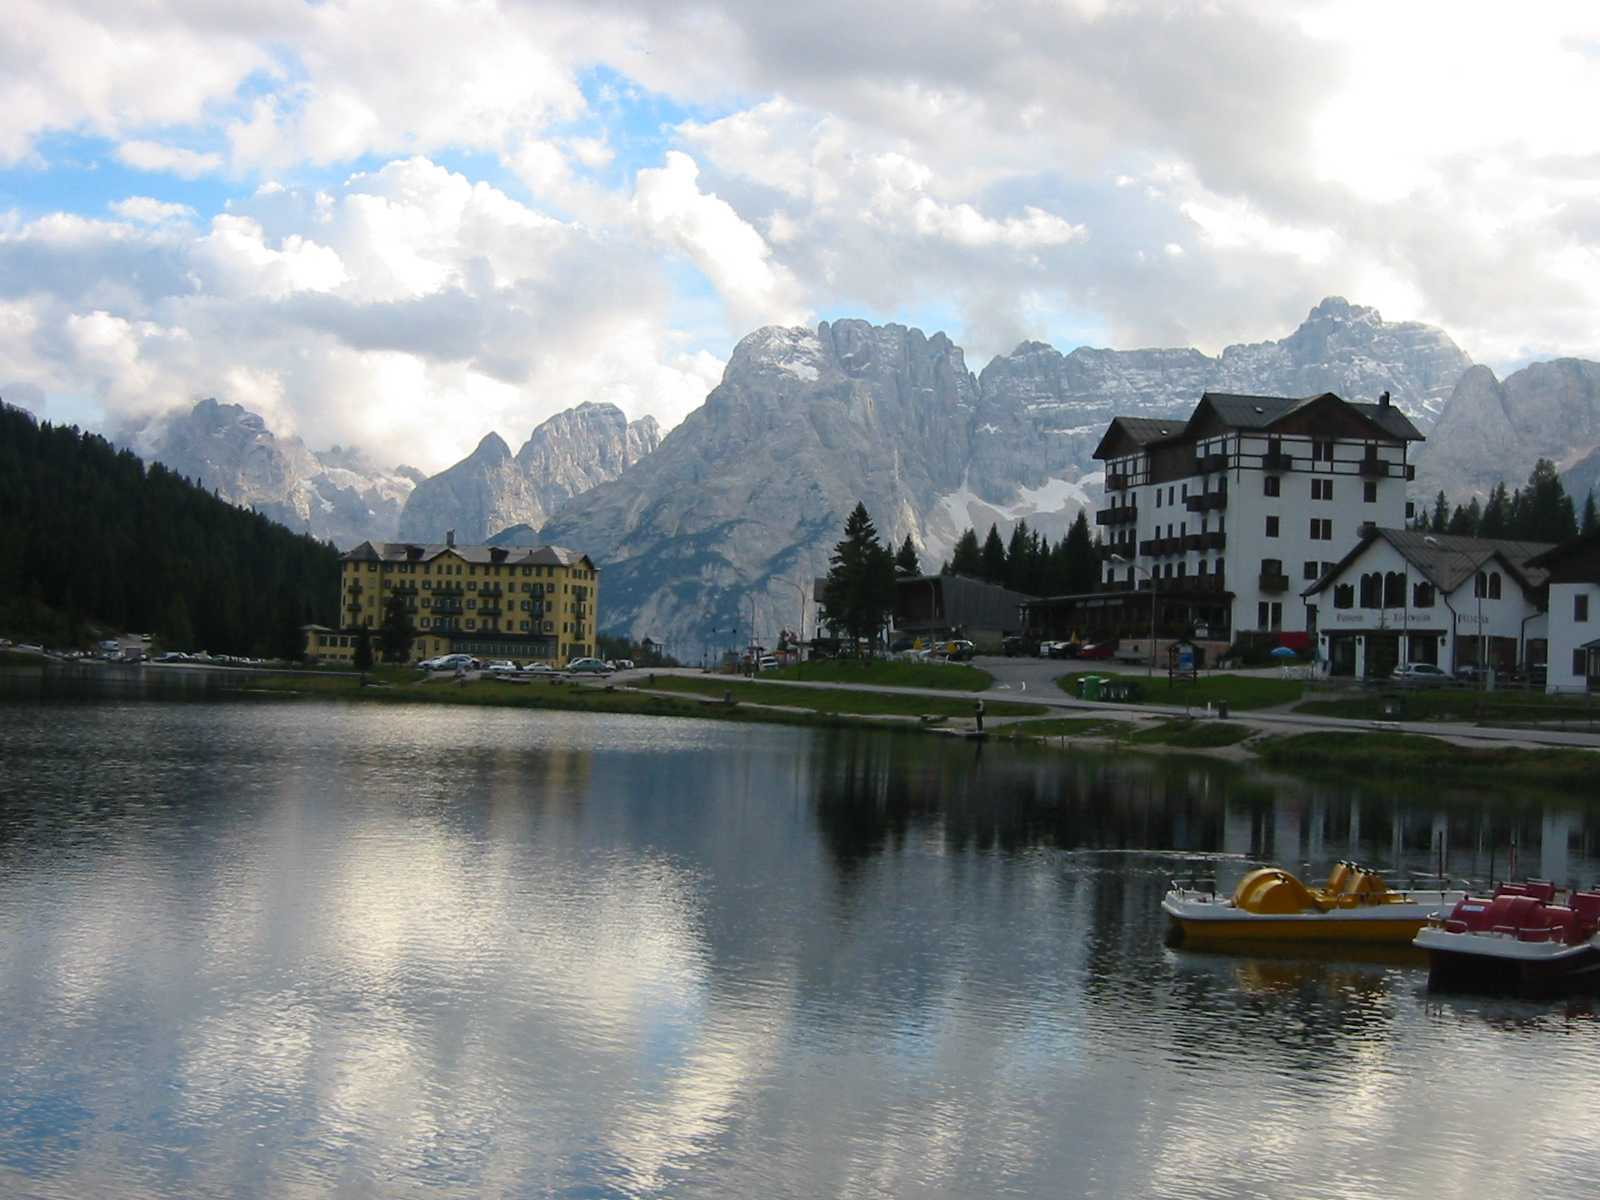 File:Lago di Misurina 1.JPG - Wikipedia, the free encyclopedia: en.wikipedia.org/wiki/file:lago_di_misurina_1.jpg